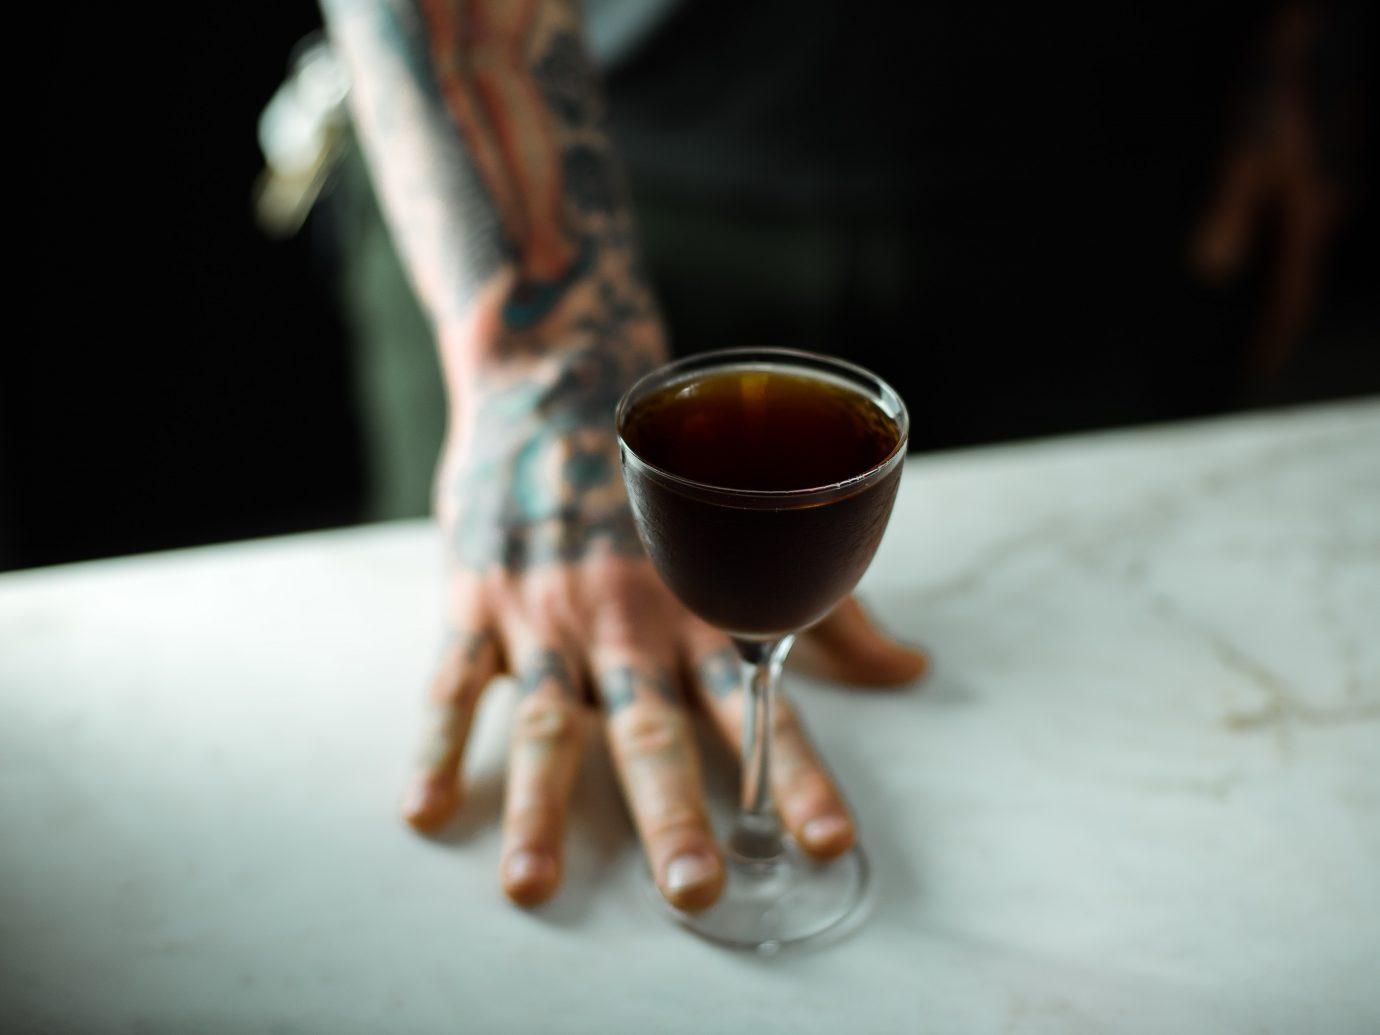 Black Manhattan cocktail served by tattooed arm